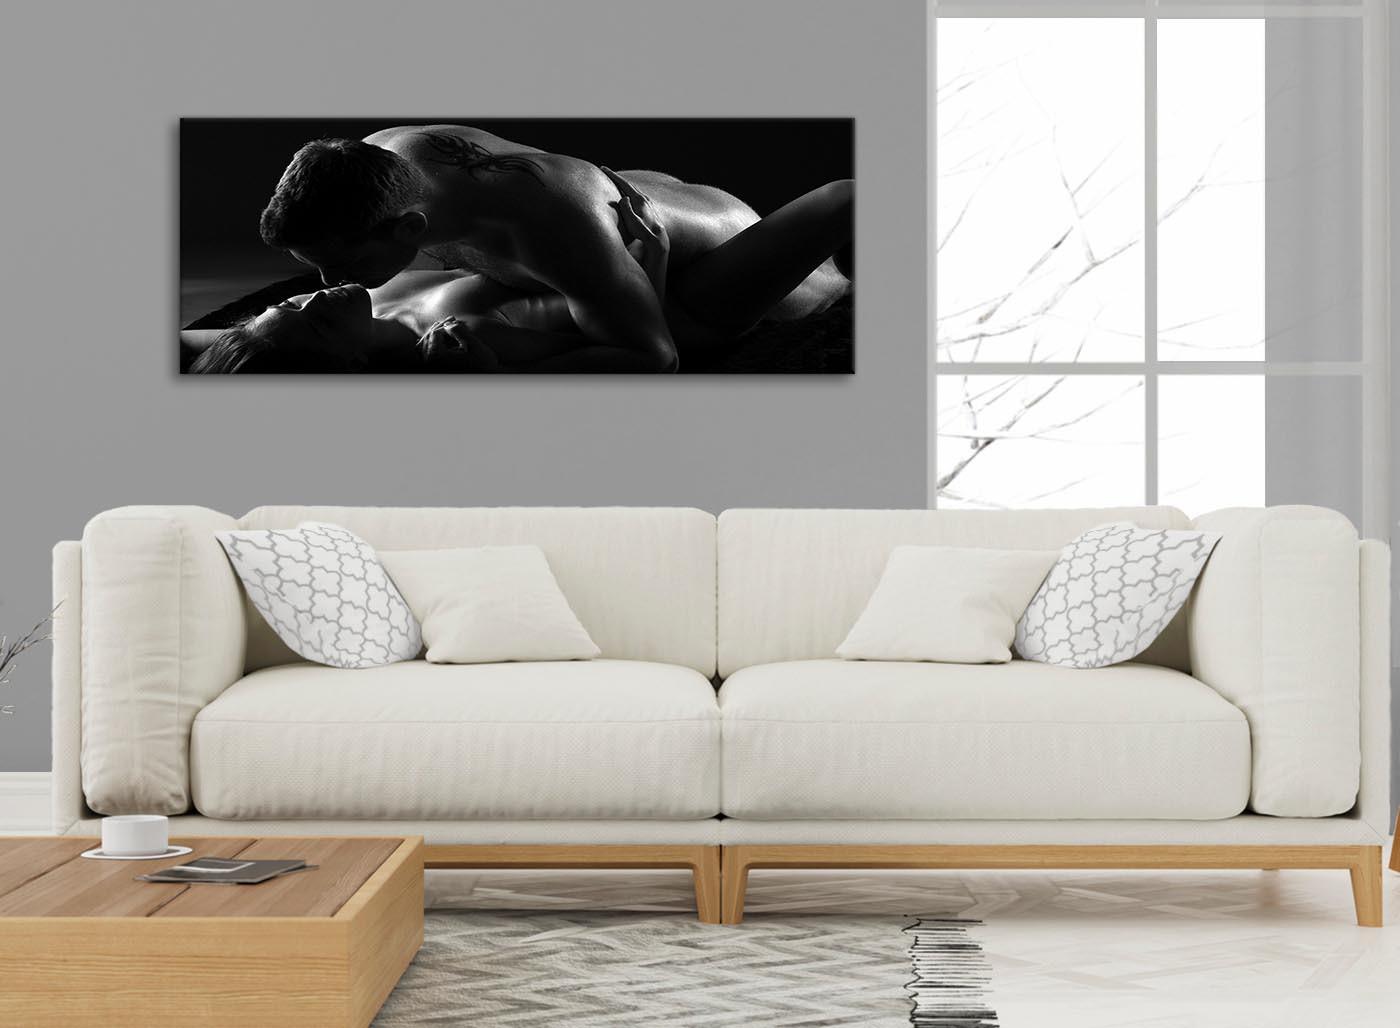 Romantic Nude Couple Erotica Canvas Art Pictures - 1444 Black White - 120Cm Wide Print-7993